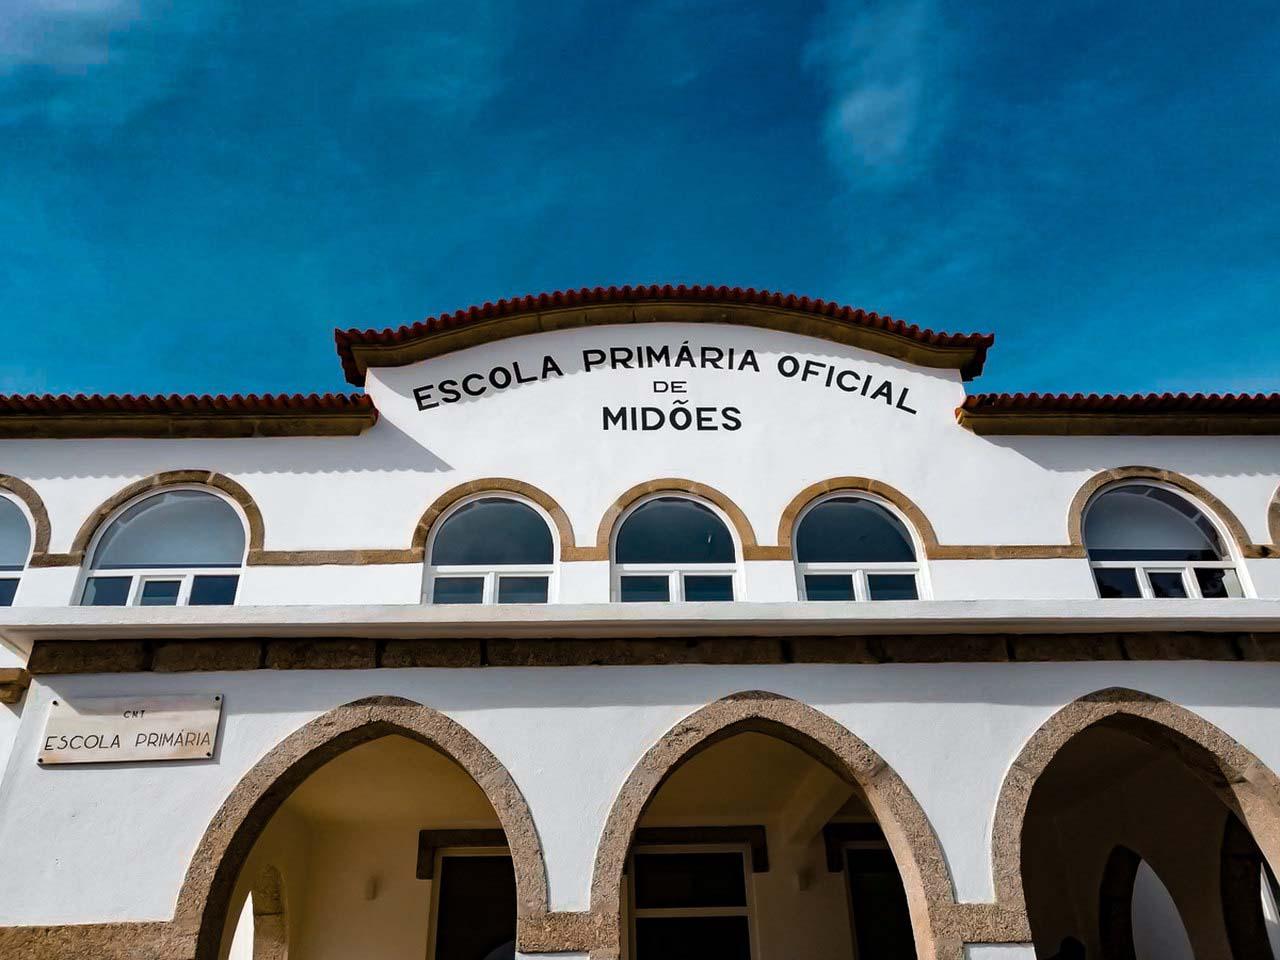 Midões School